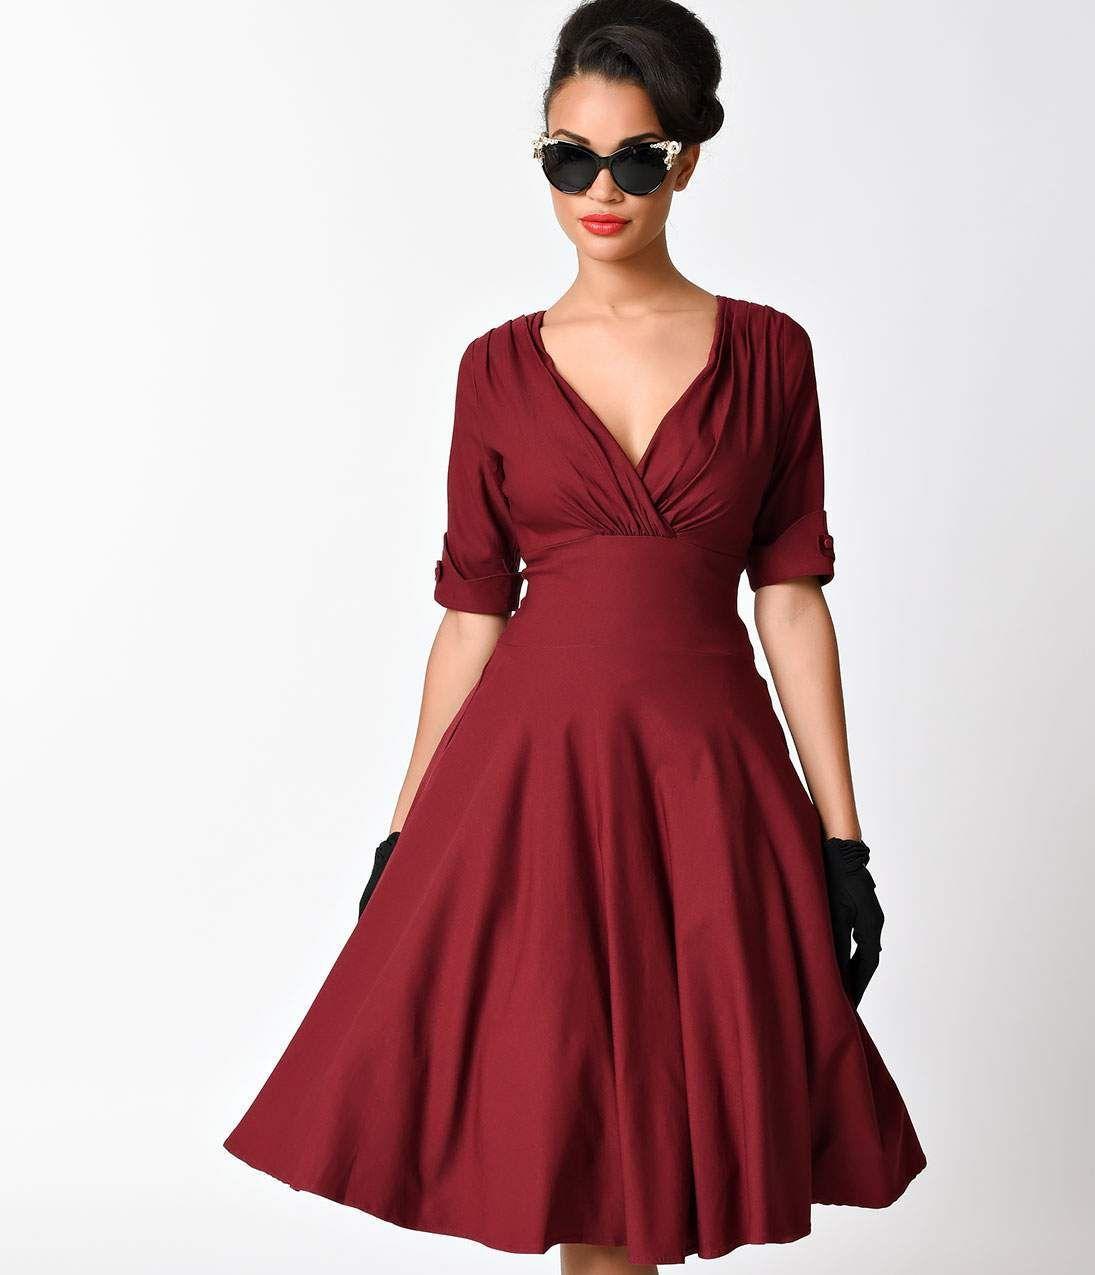 Unique Vintage 1950s Burgundy Red Delores Swing Dress With Sleeves In 2020 Vintage 1950s Dresses Swing Dress With Sleeves Burgundy Short Dress